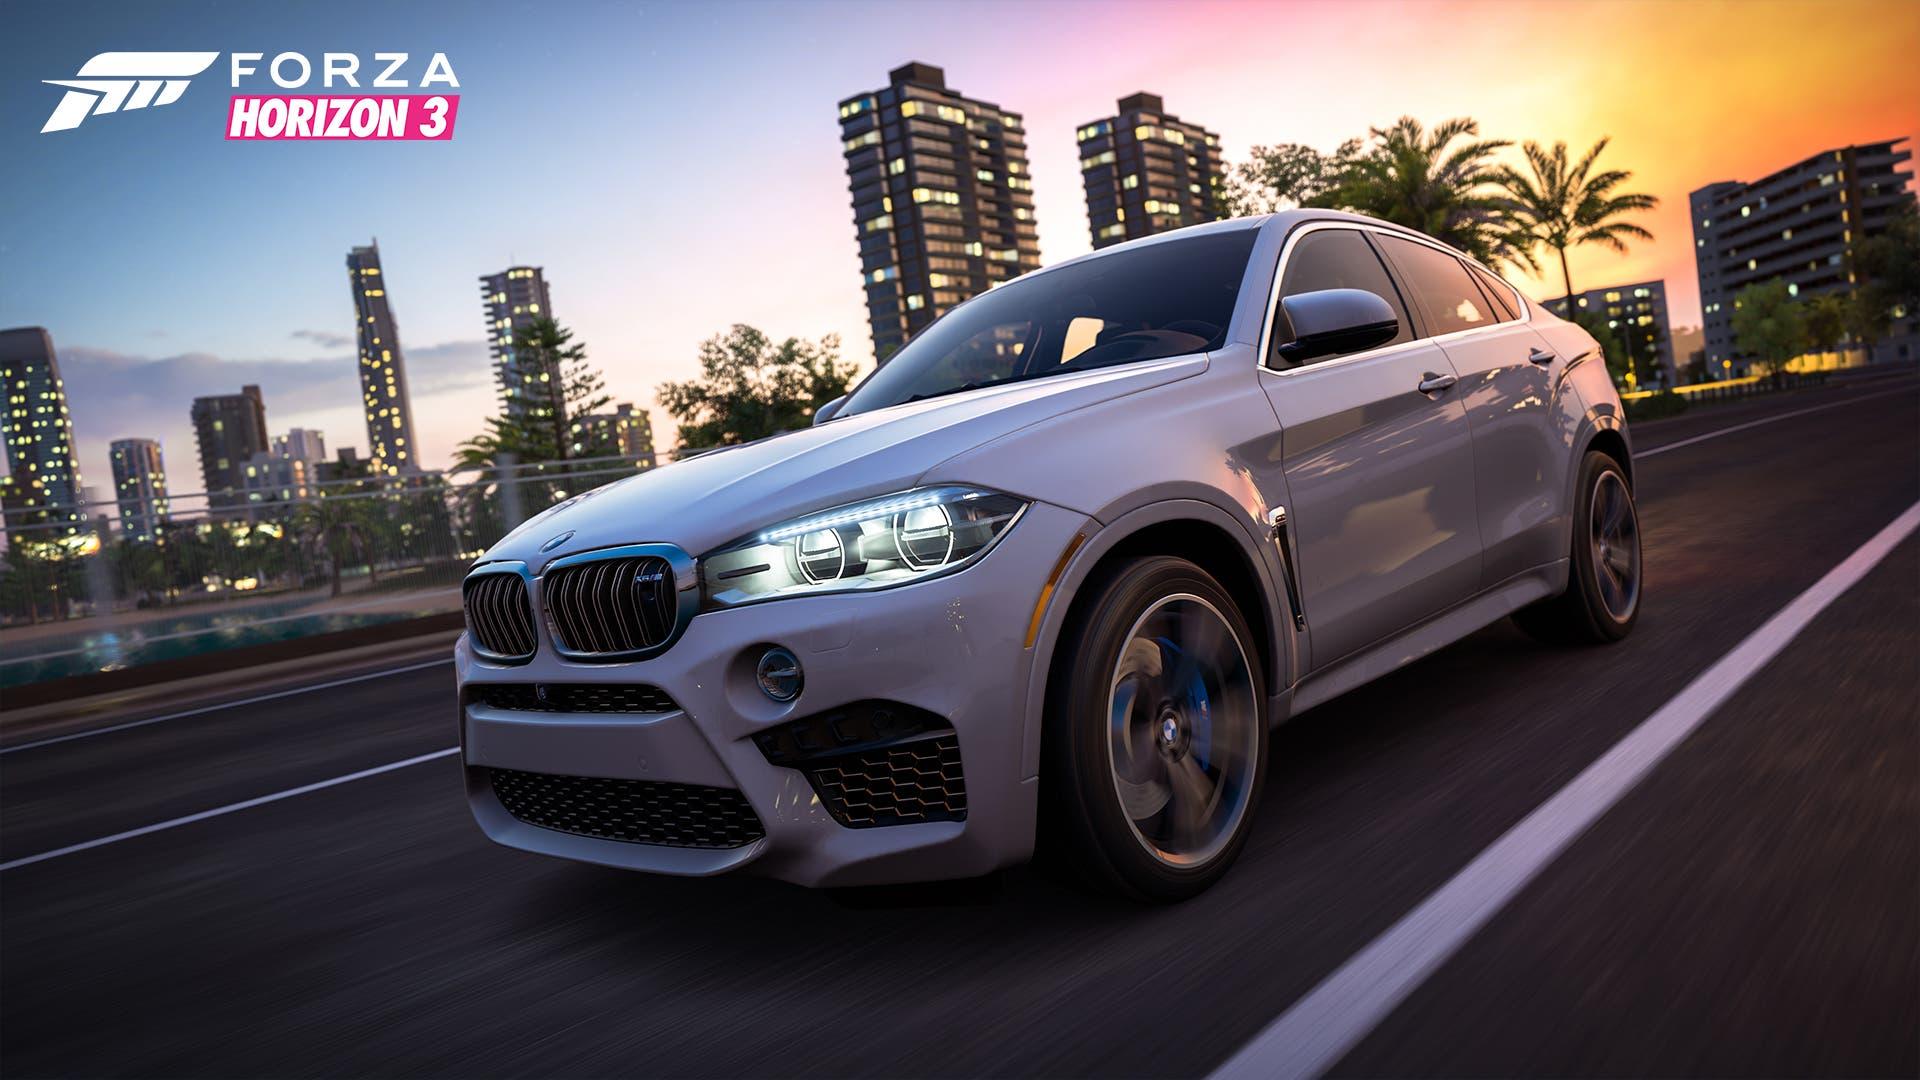 BMWX6M_WM_FH3_CarAnnounce_Week03